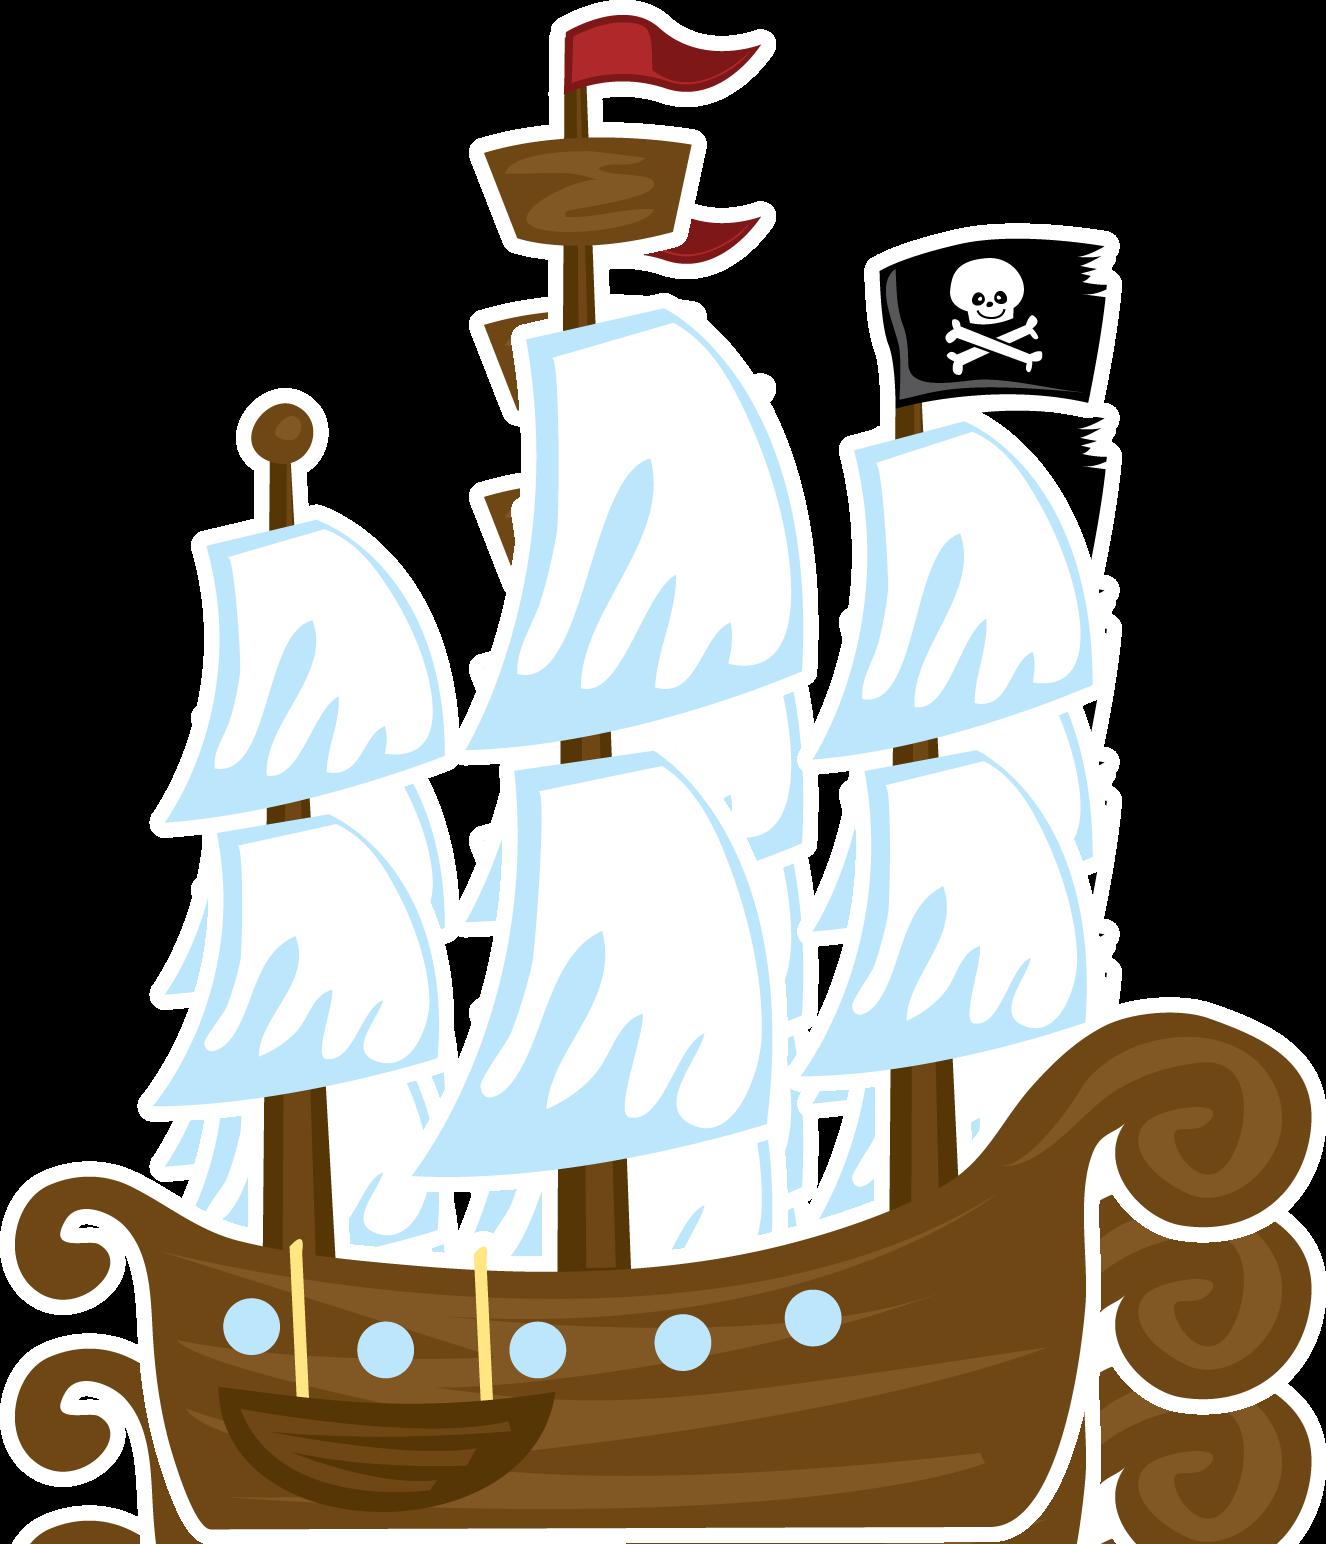 Idhauq2tub08j Png 1326 1544 Pirate Clip Art Clip Art Cartoon Pirate Ship